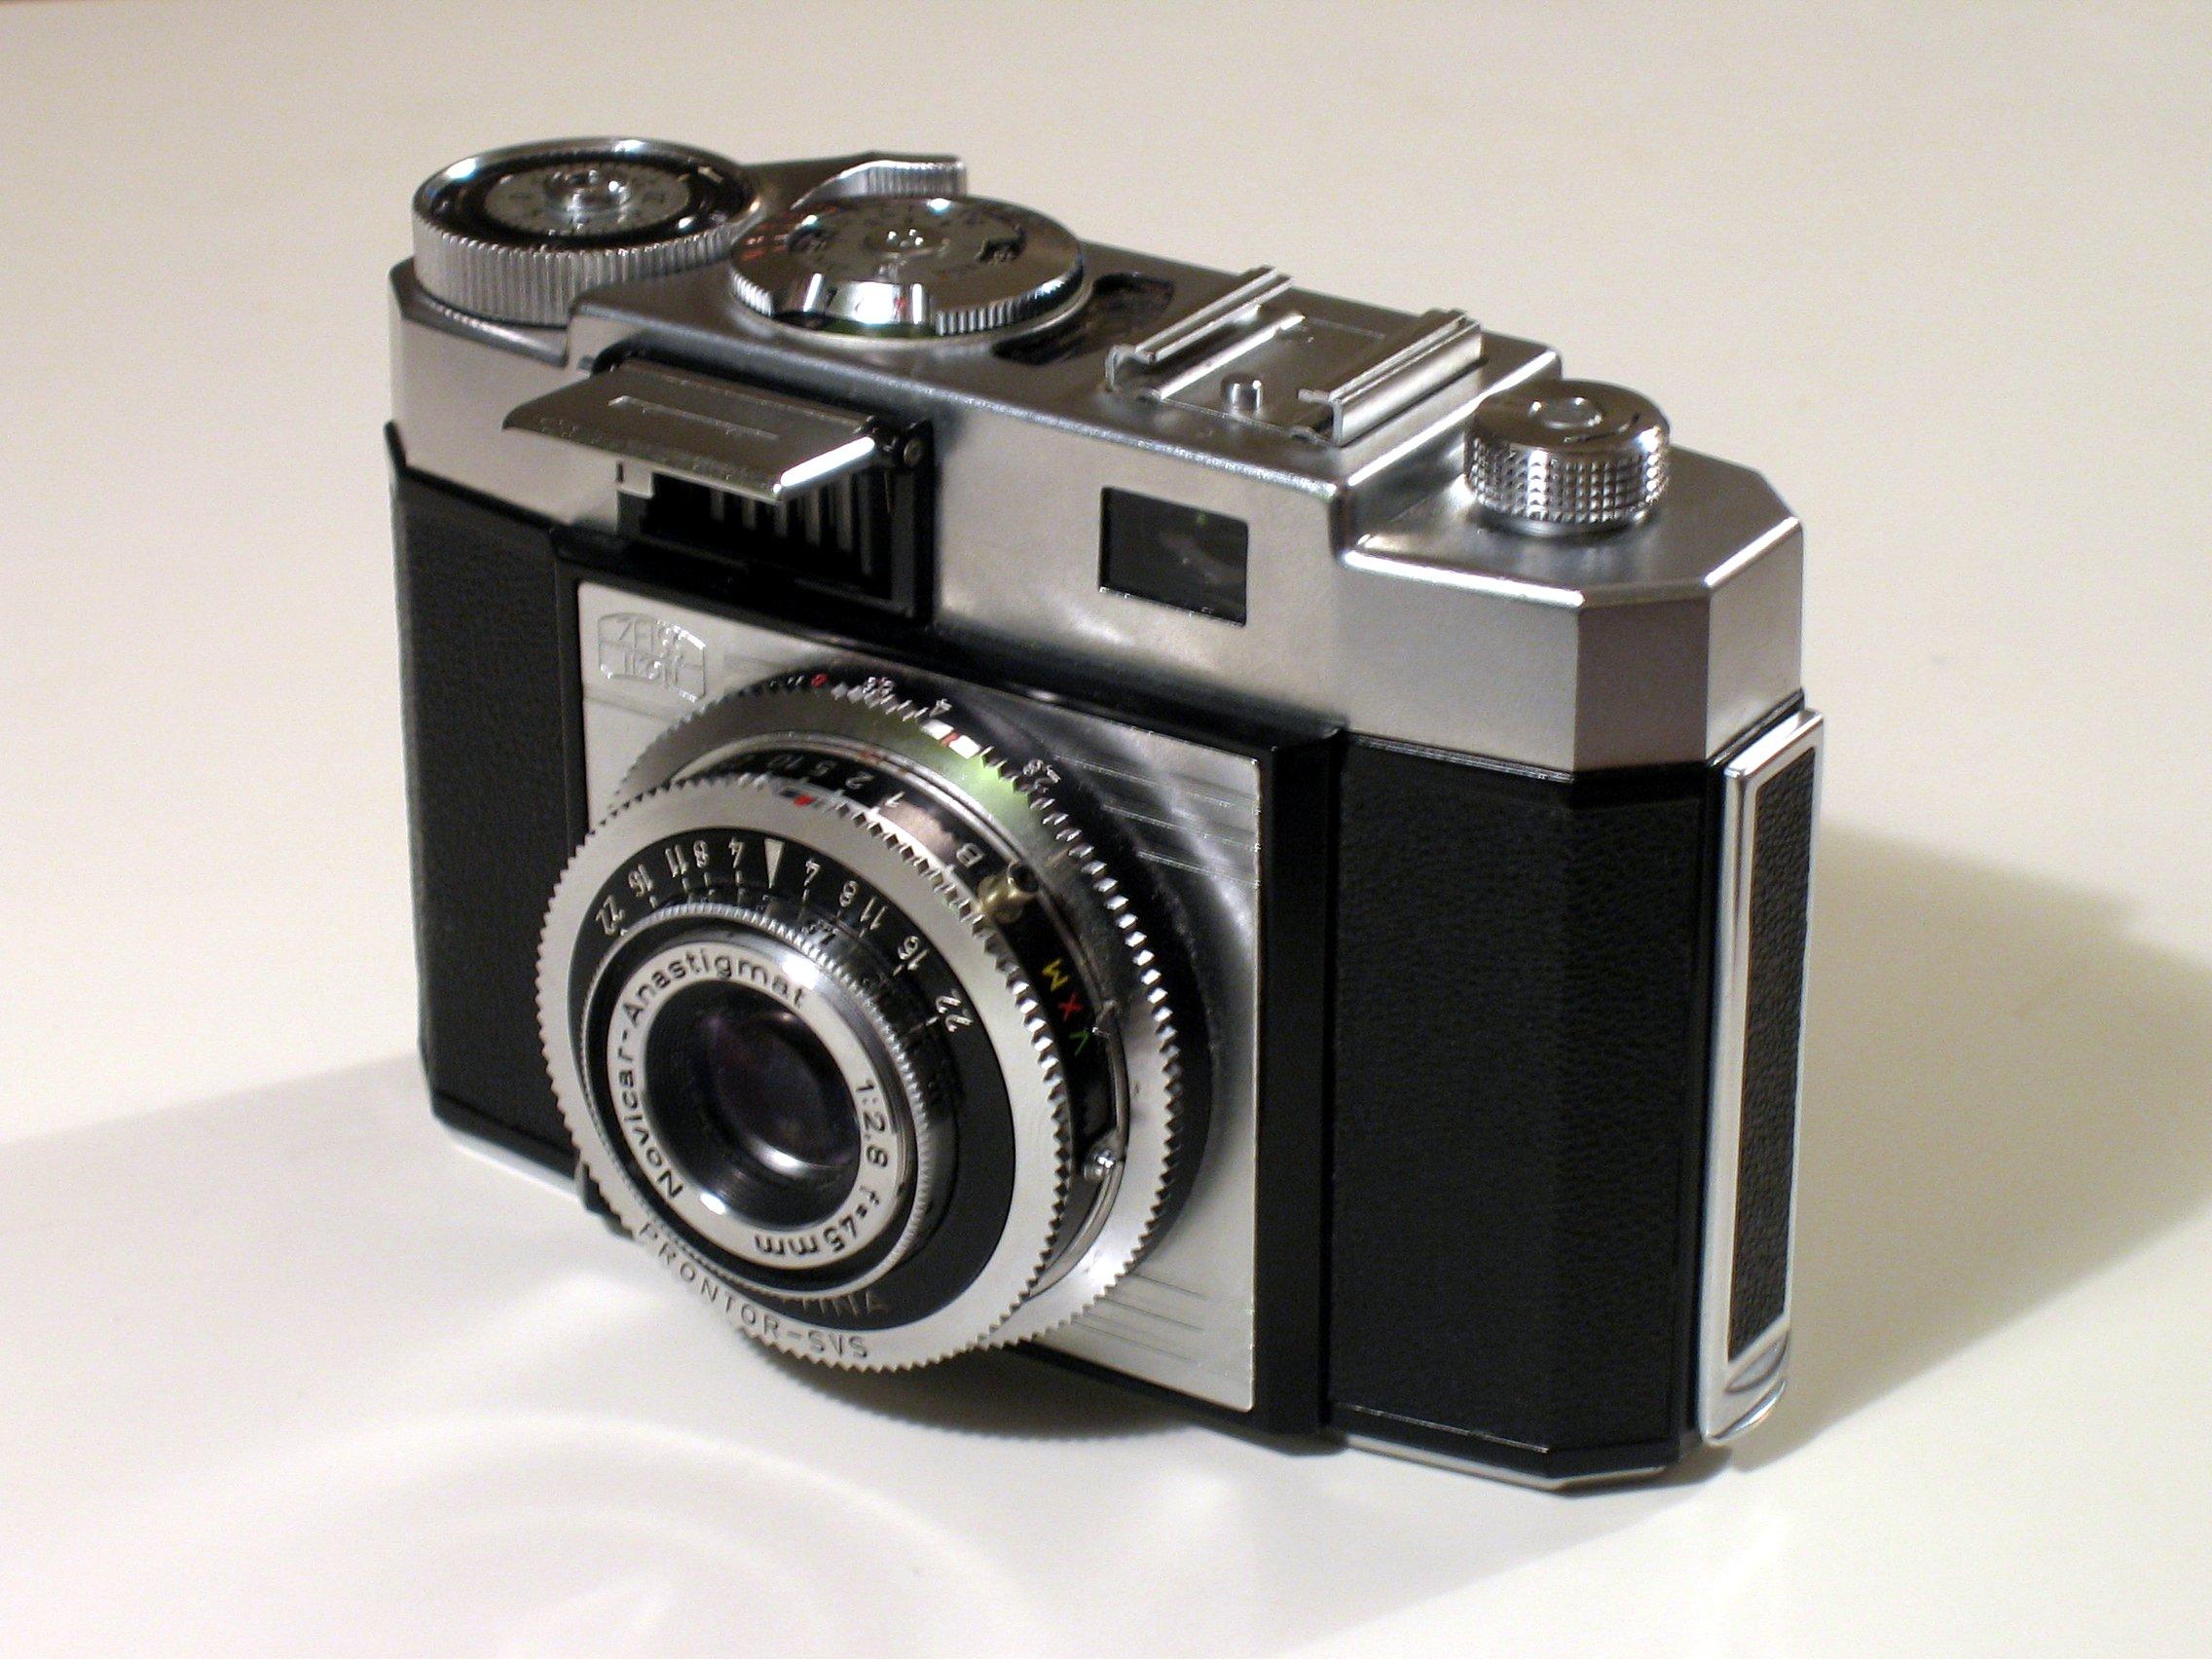 File:Old camera-whole.jpg - Wikipedia